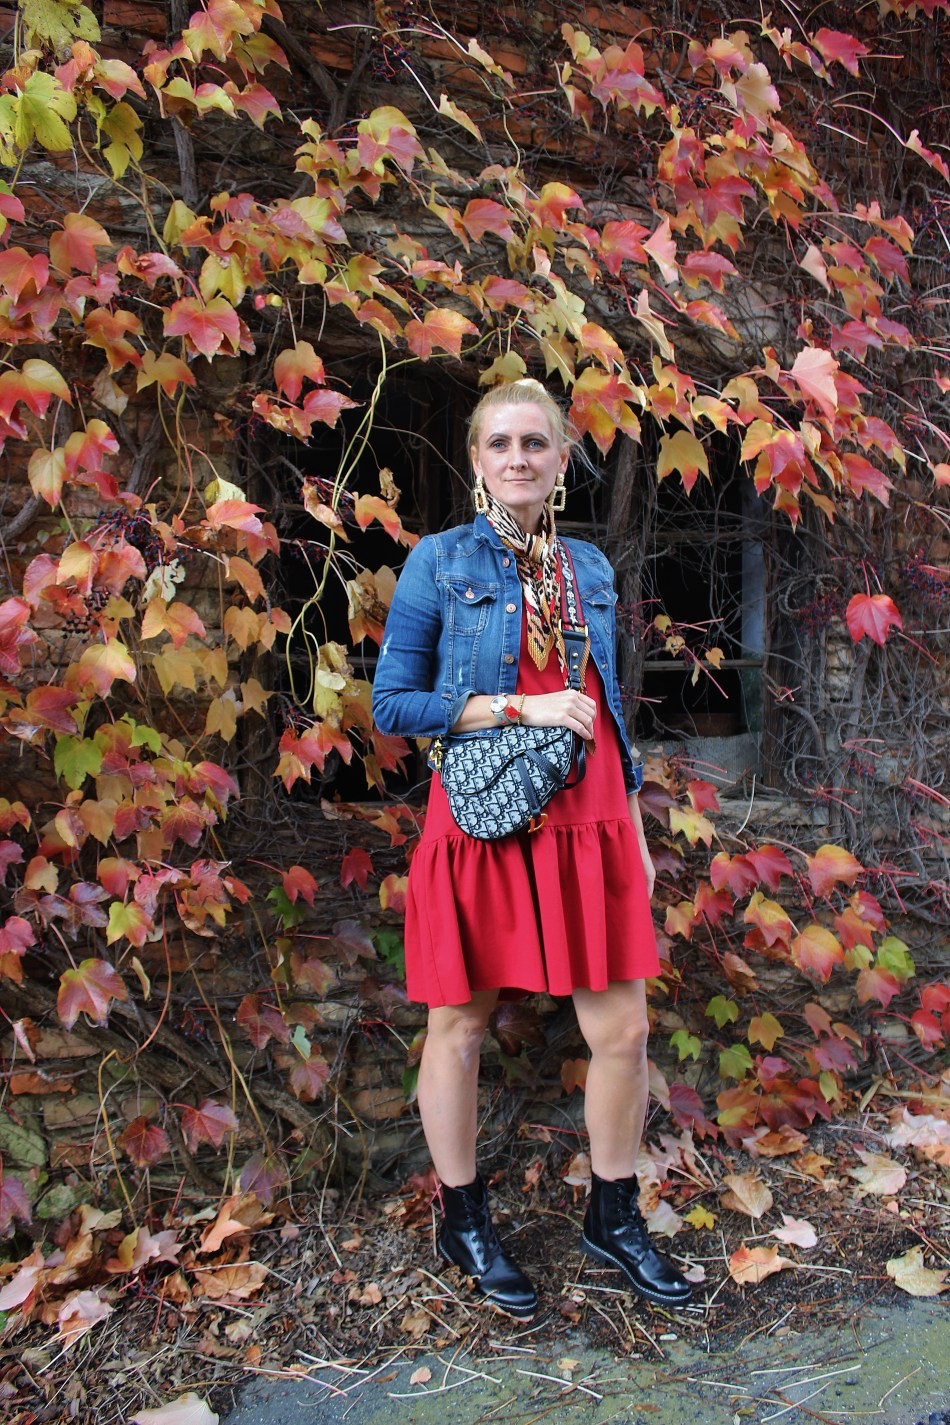 Fall-Autumn-Herbstlook-DrMartens-Boots-Deichmann-Dior-Saddlebag-Zara-Ohrringe-Zaradress-Redwine-Dress-streetstyle-Tamara-Prutsch-carrieslifestyle-Herbst